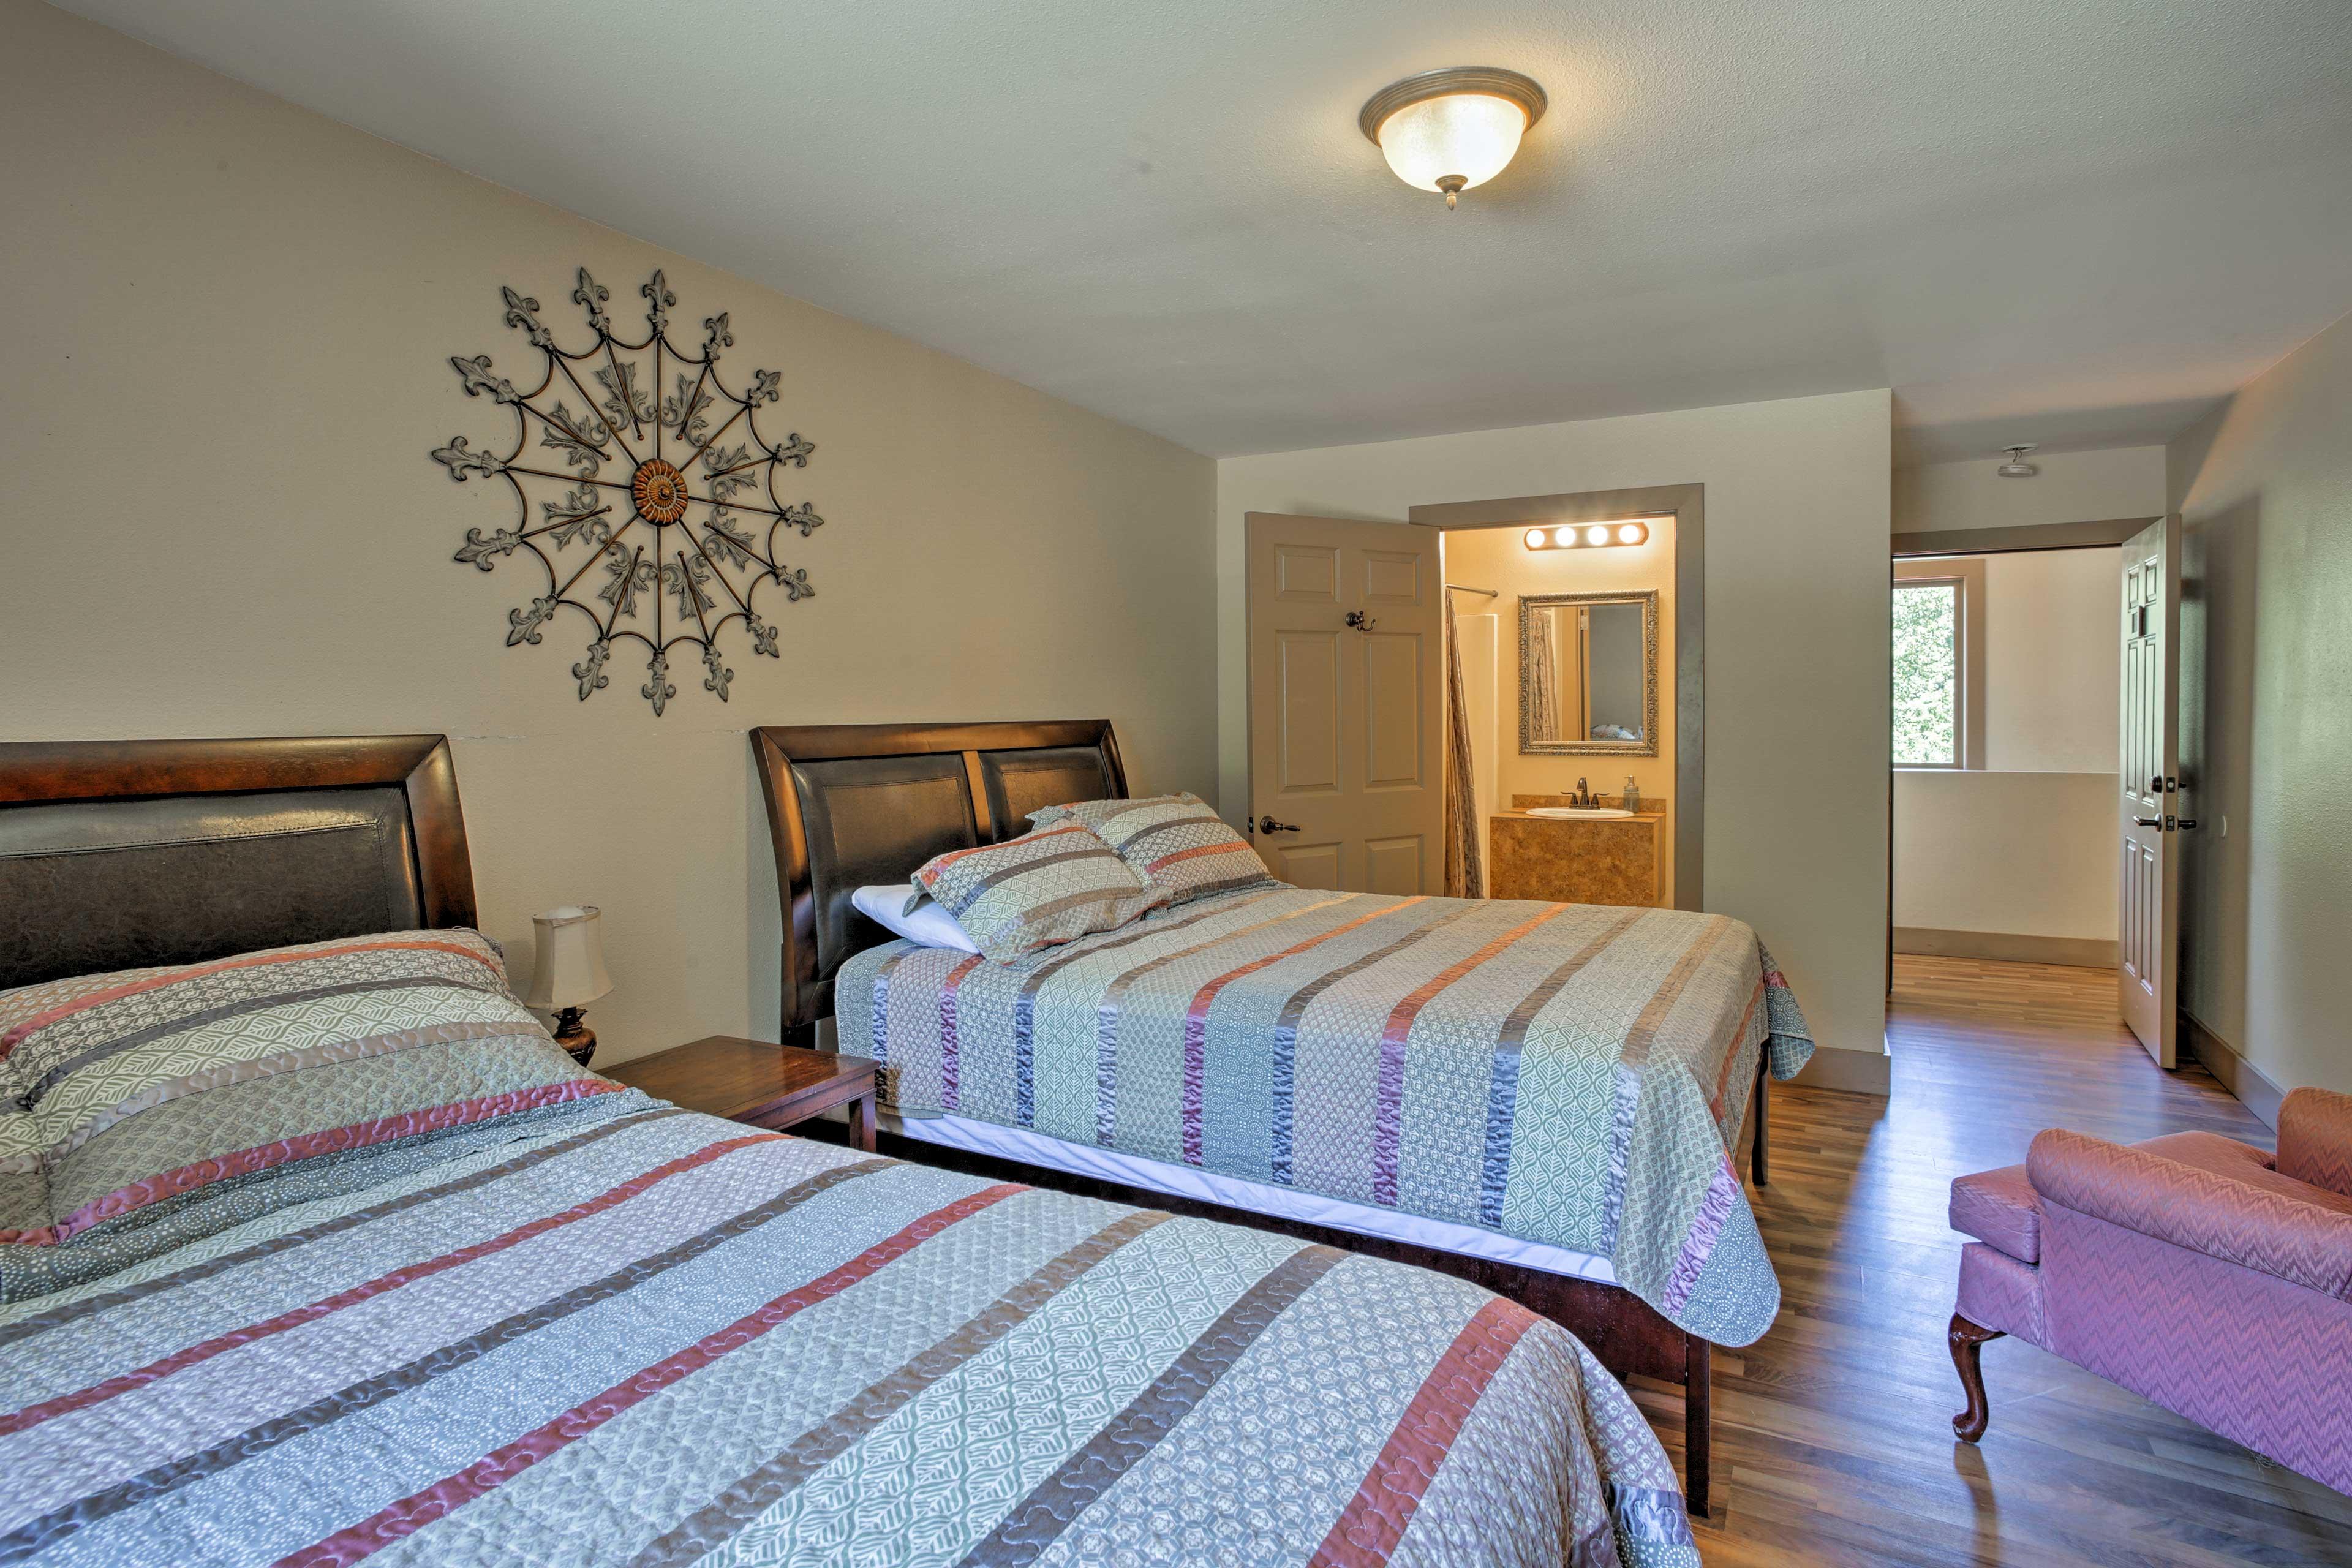 Another bedroom has 2 queen beds that promise peaceful sleeping.